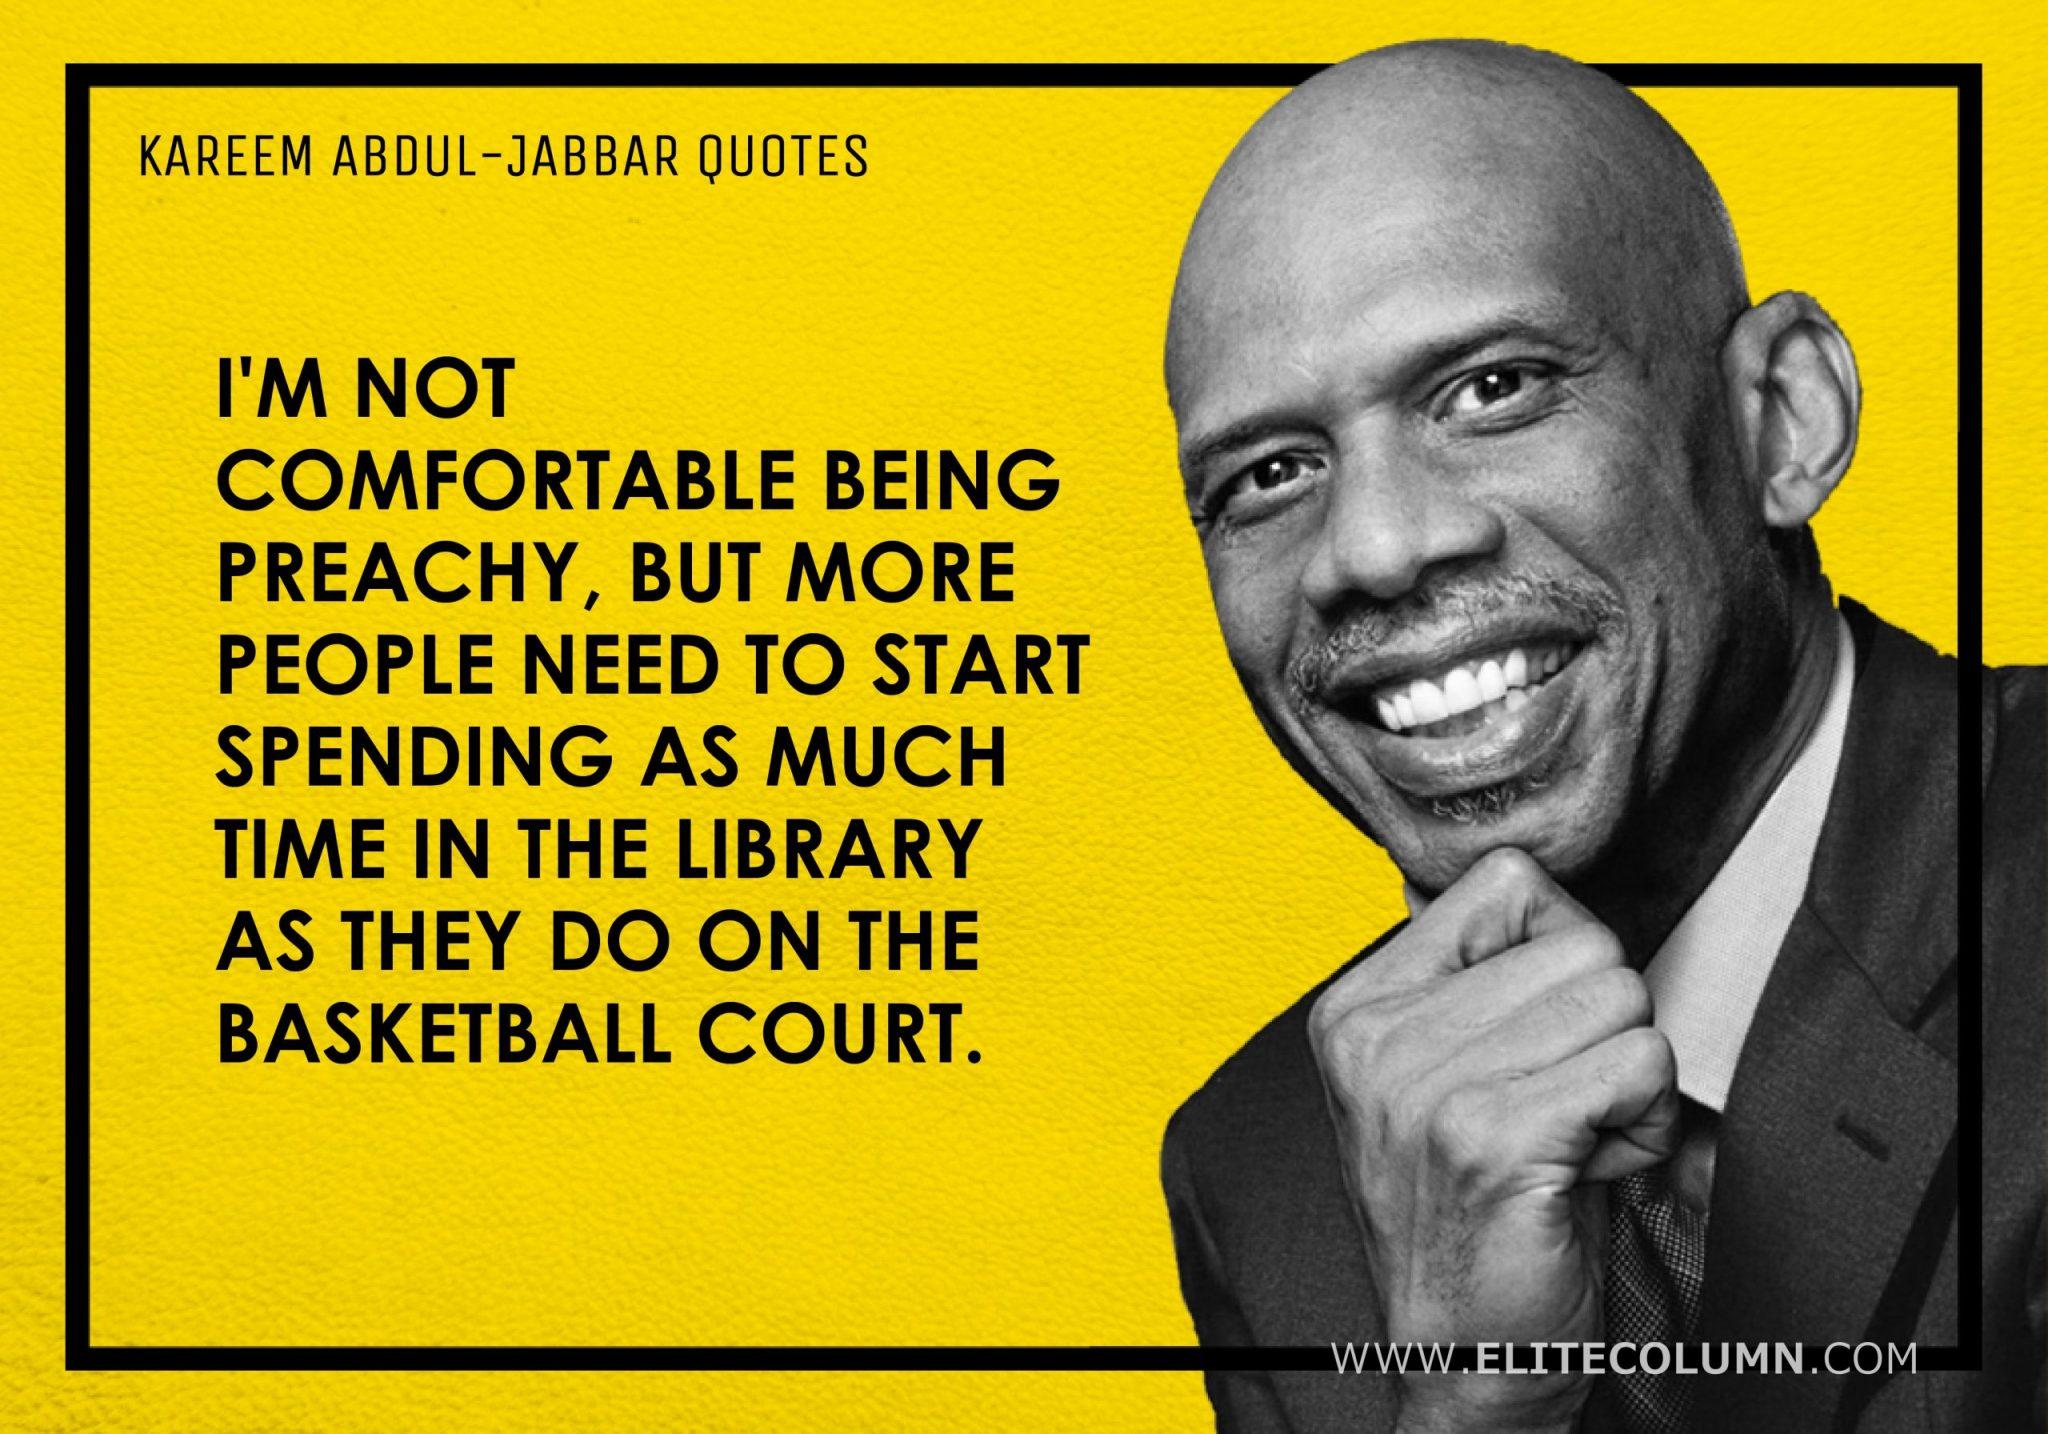 Kareem Abdul-Jabbar Quotes (1)